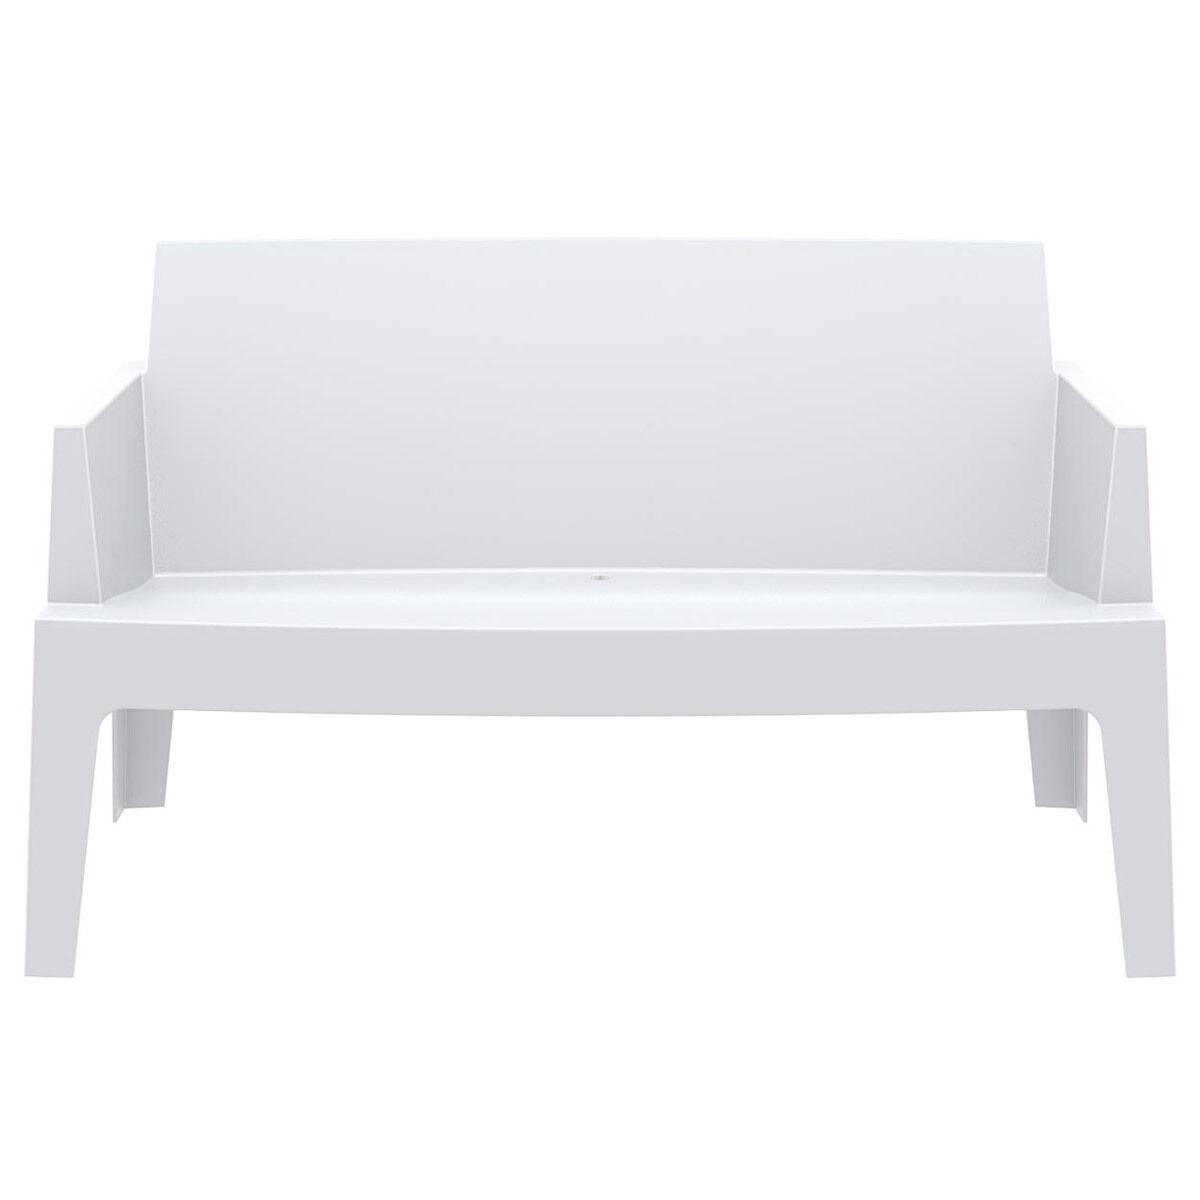 Miliboo Banc de jardin design blanc LALI